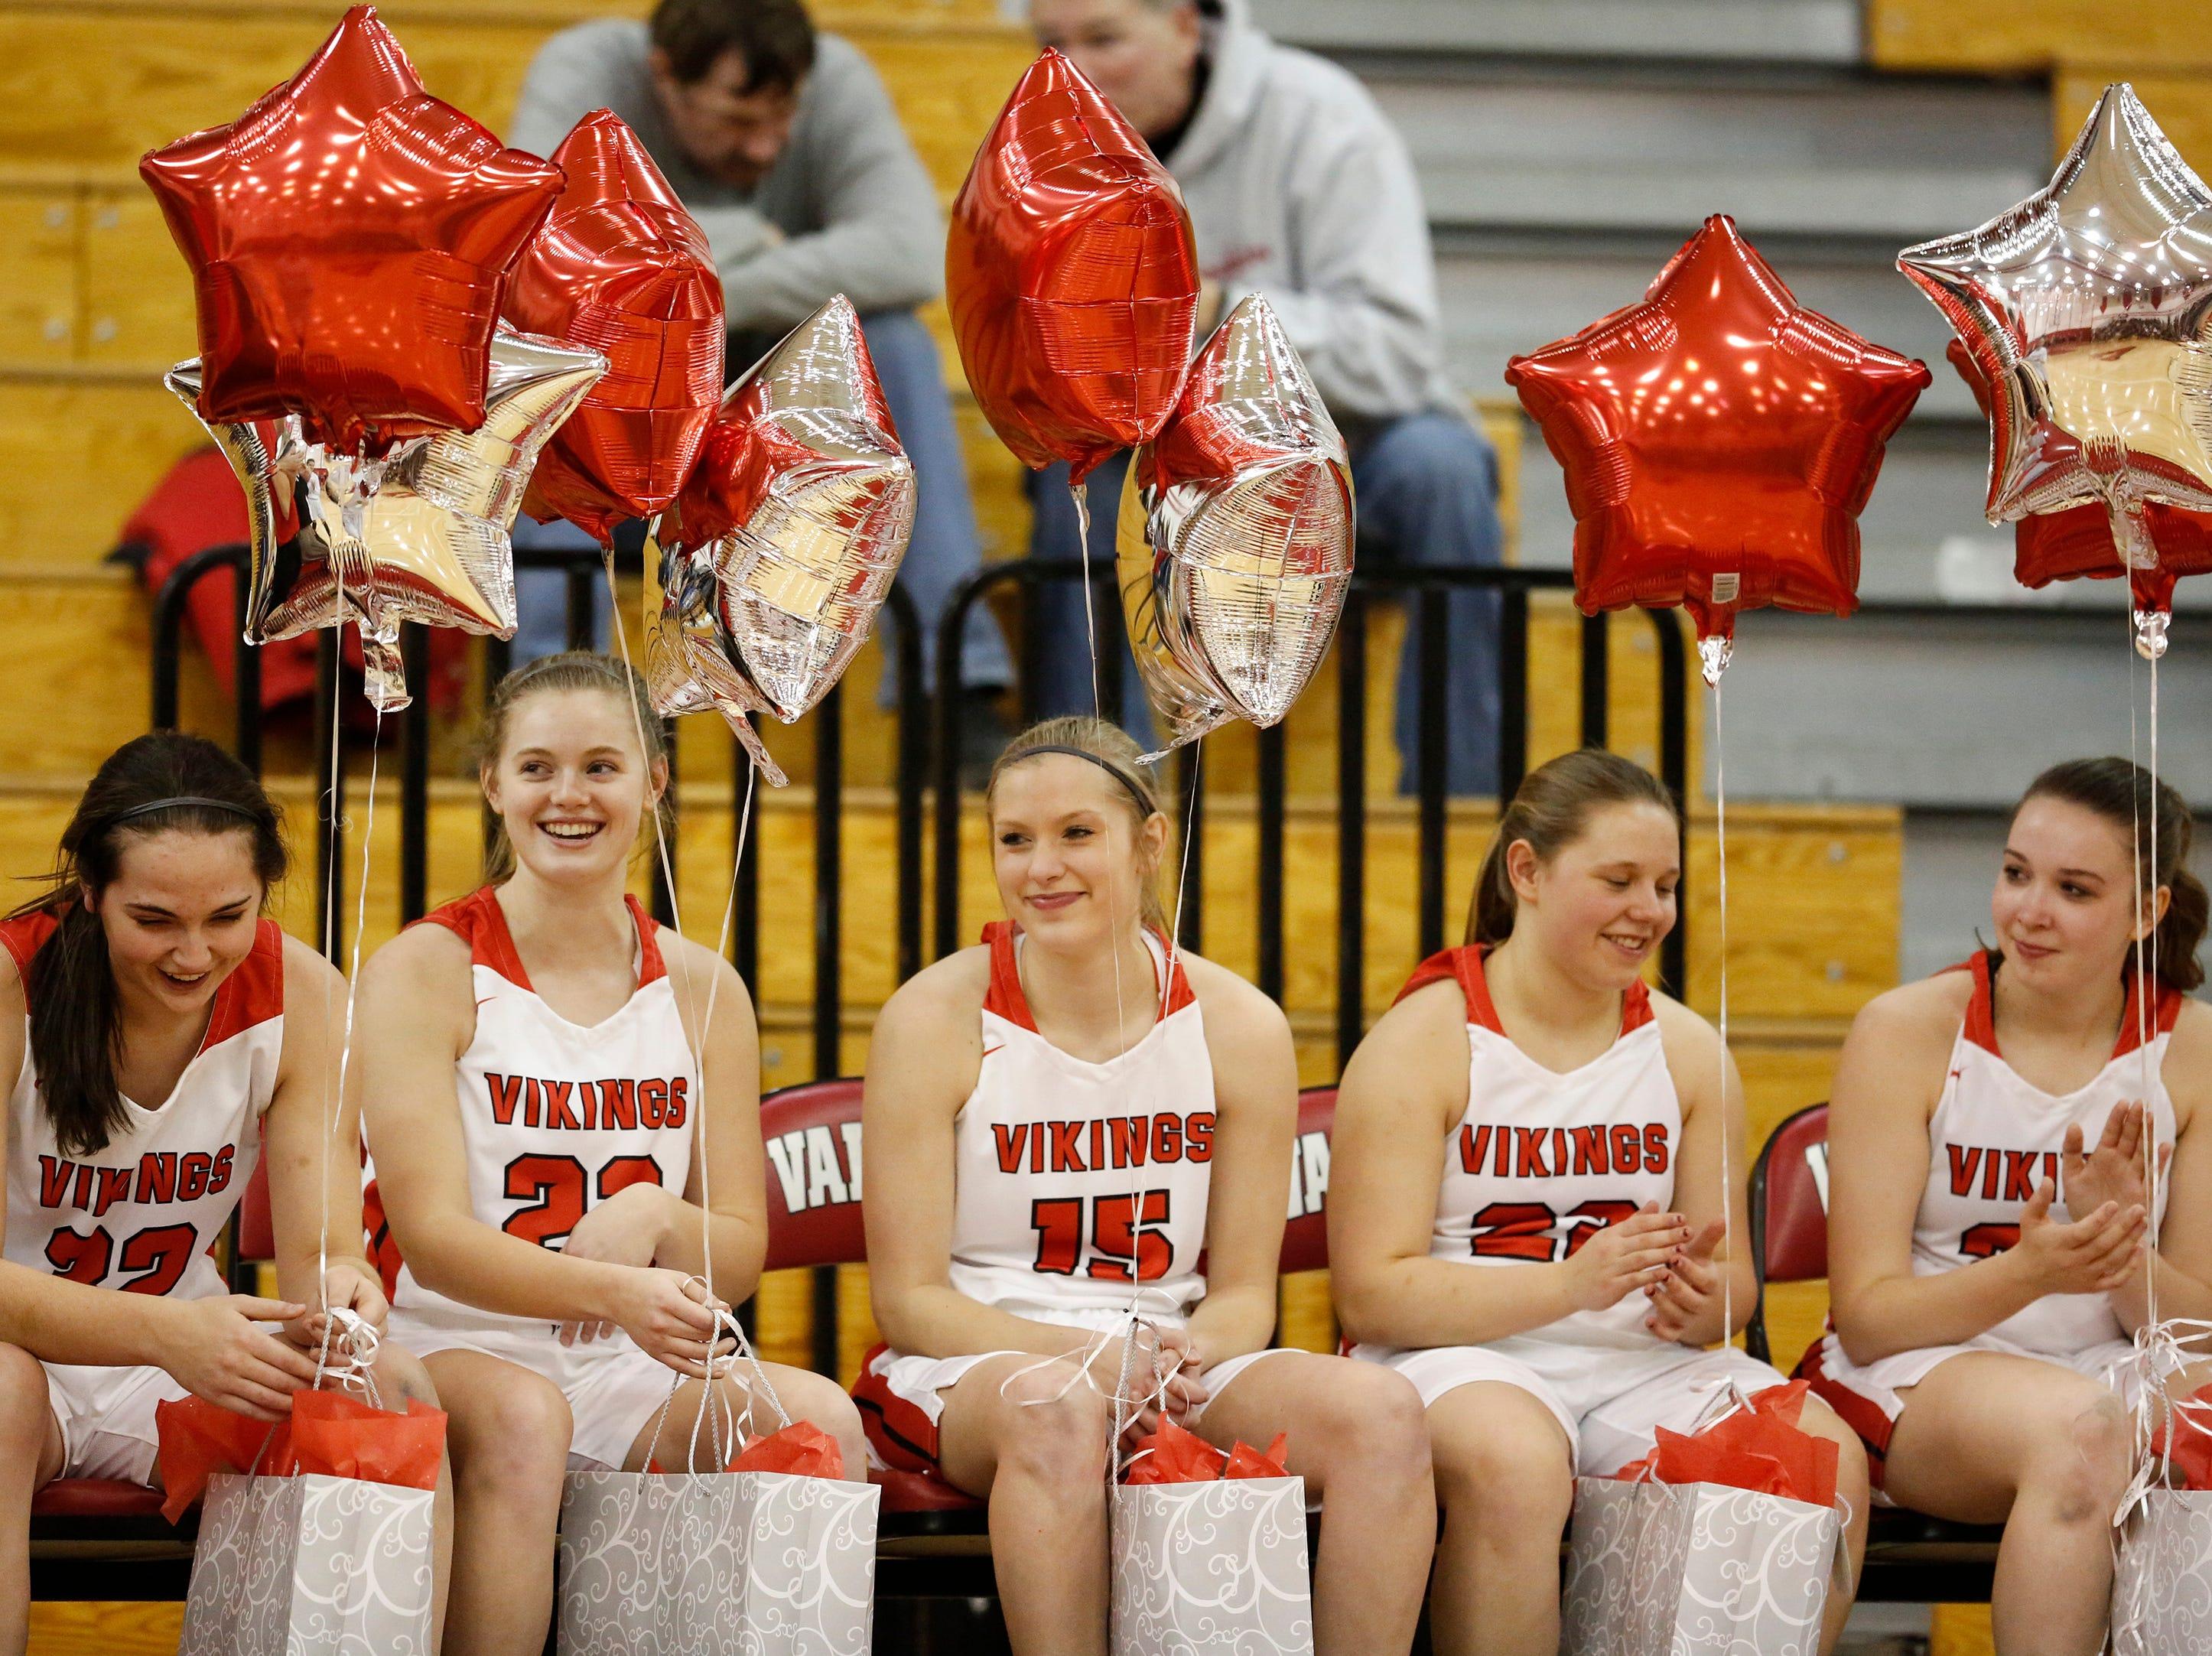 Valders' senior girls basketball players are honored on senior night before their game against New Holstein at Valders High School Friday, February 8, 2019, in Valders, Wis. Joshua Clark/USA TODAY NETWORK-Wisconsin